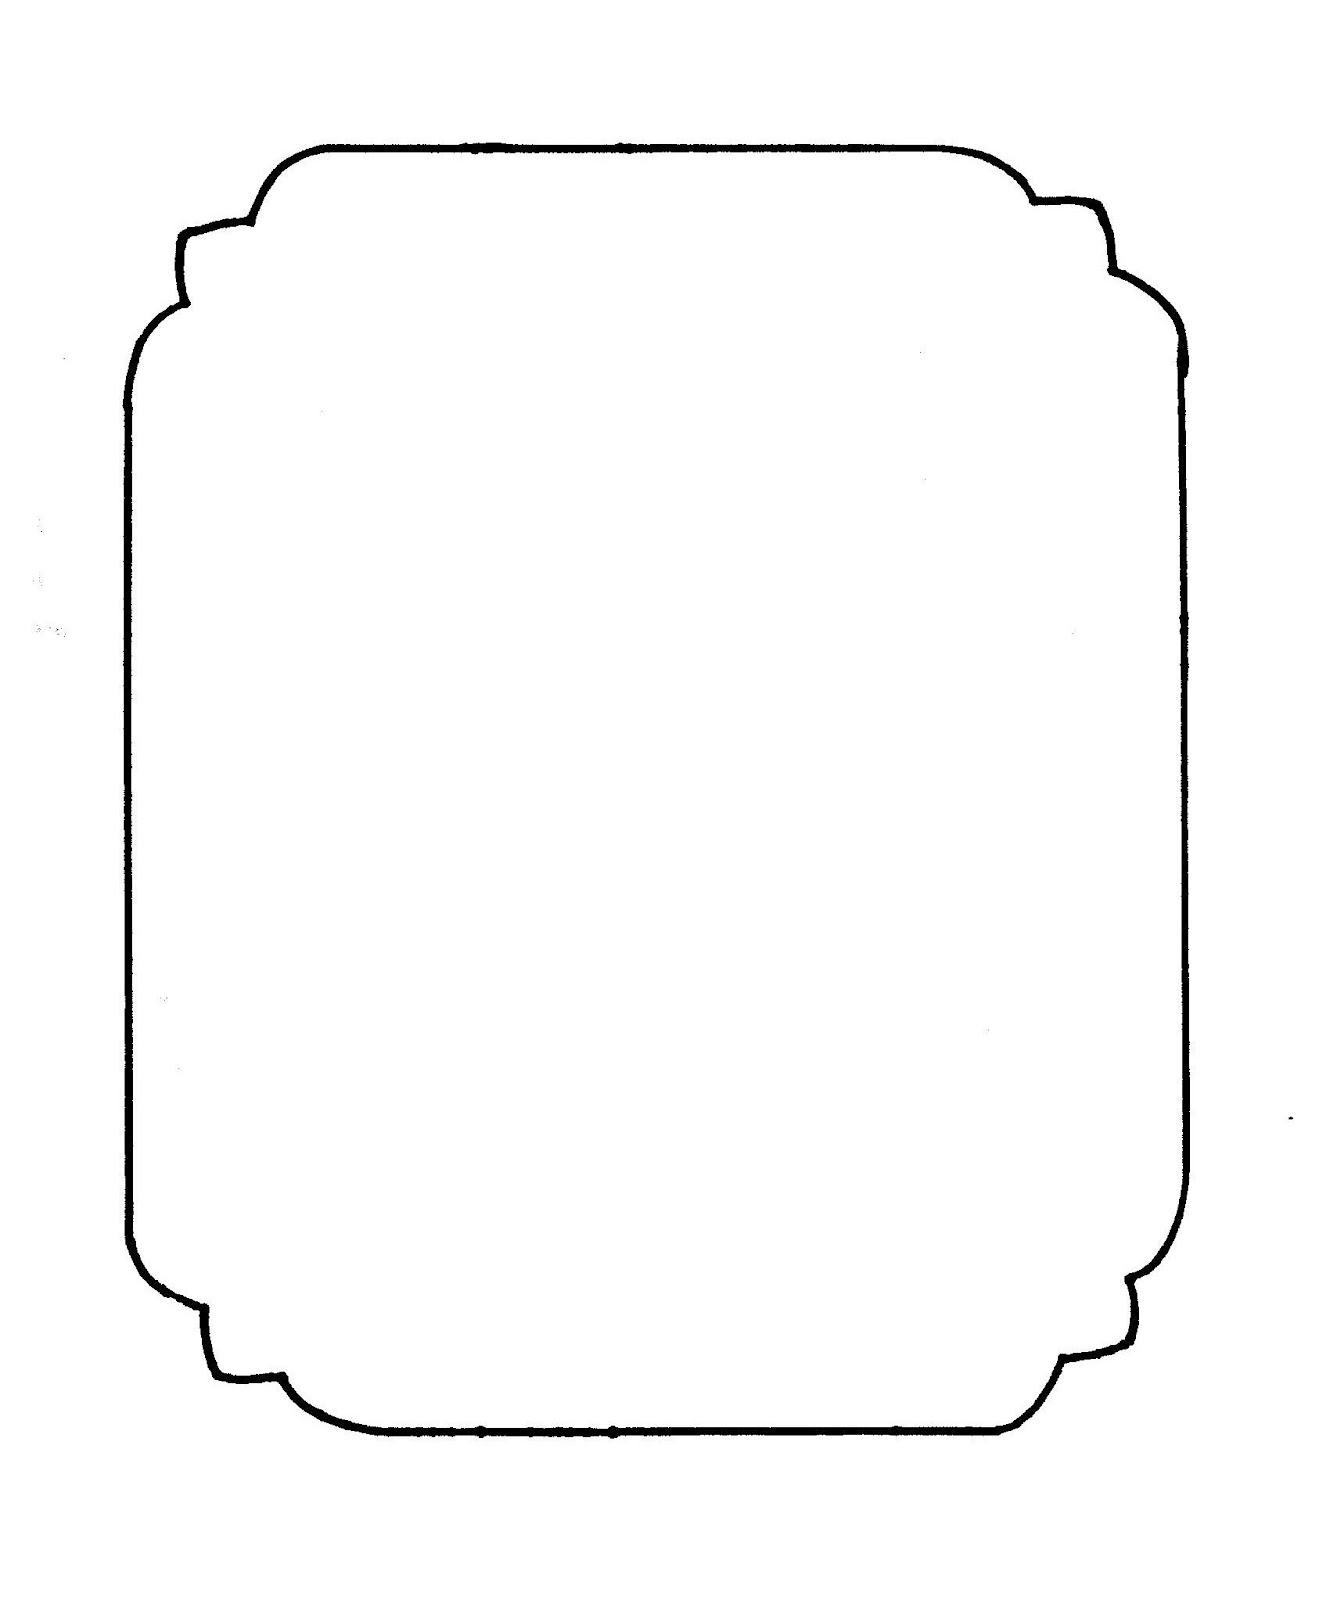 Genius image regarding free printable picture frame templates